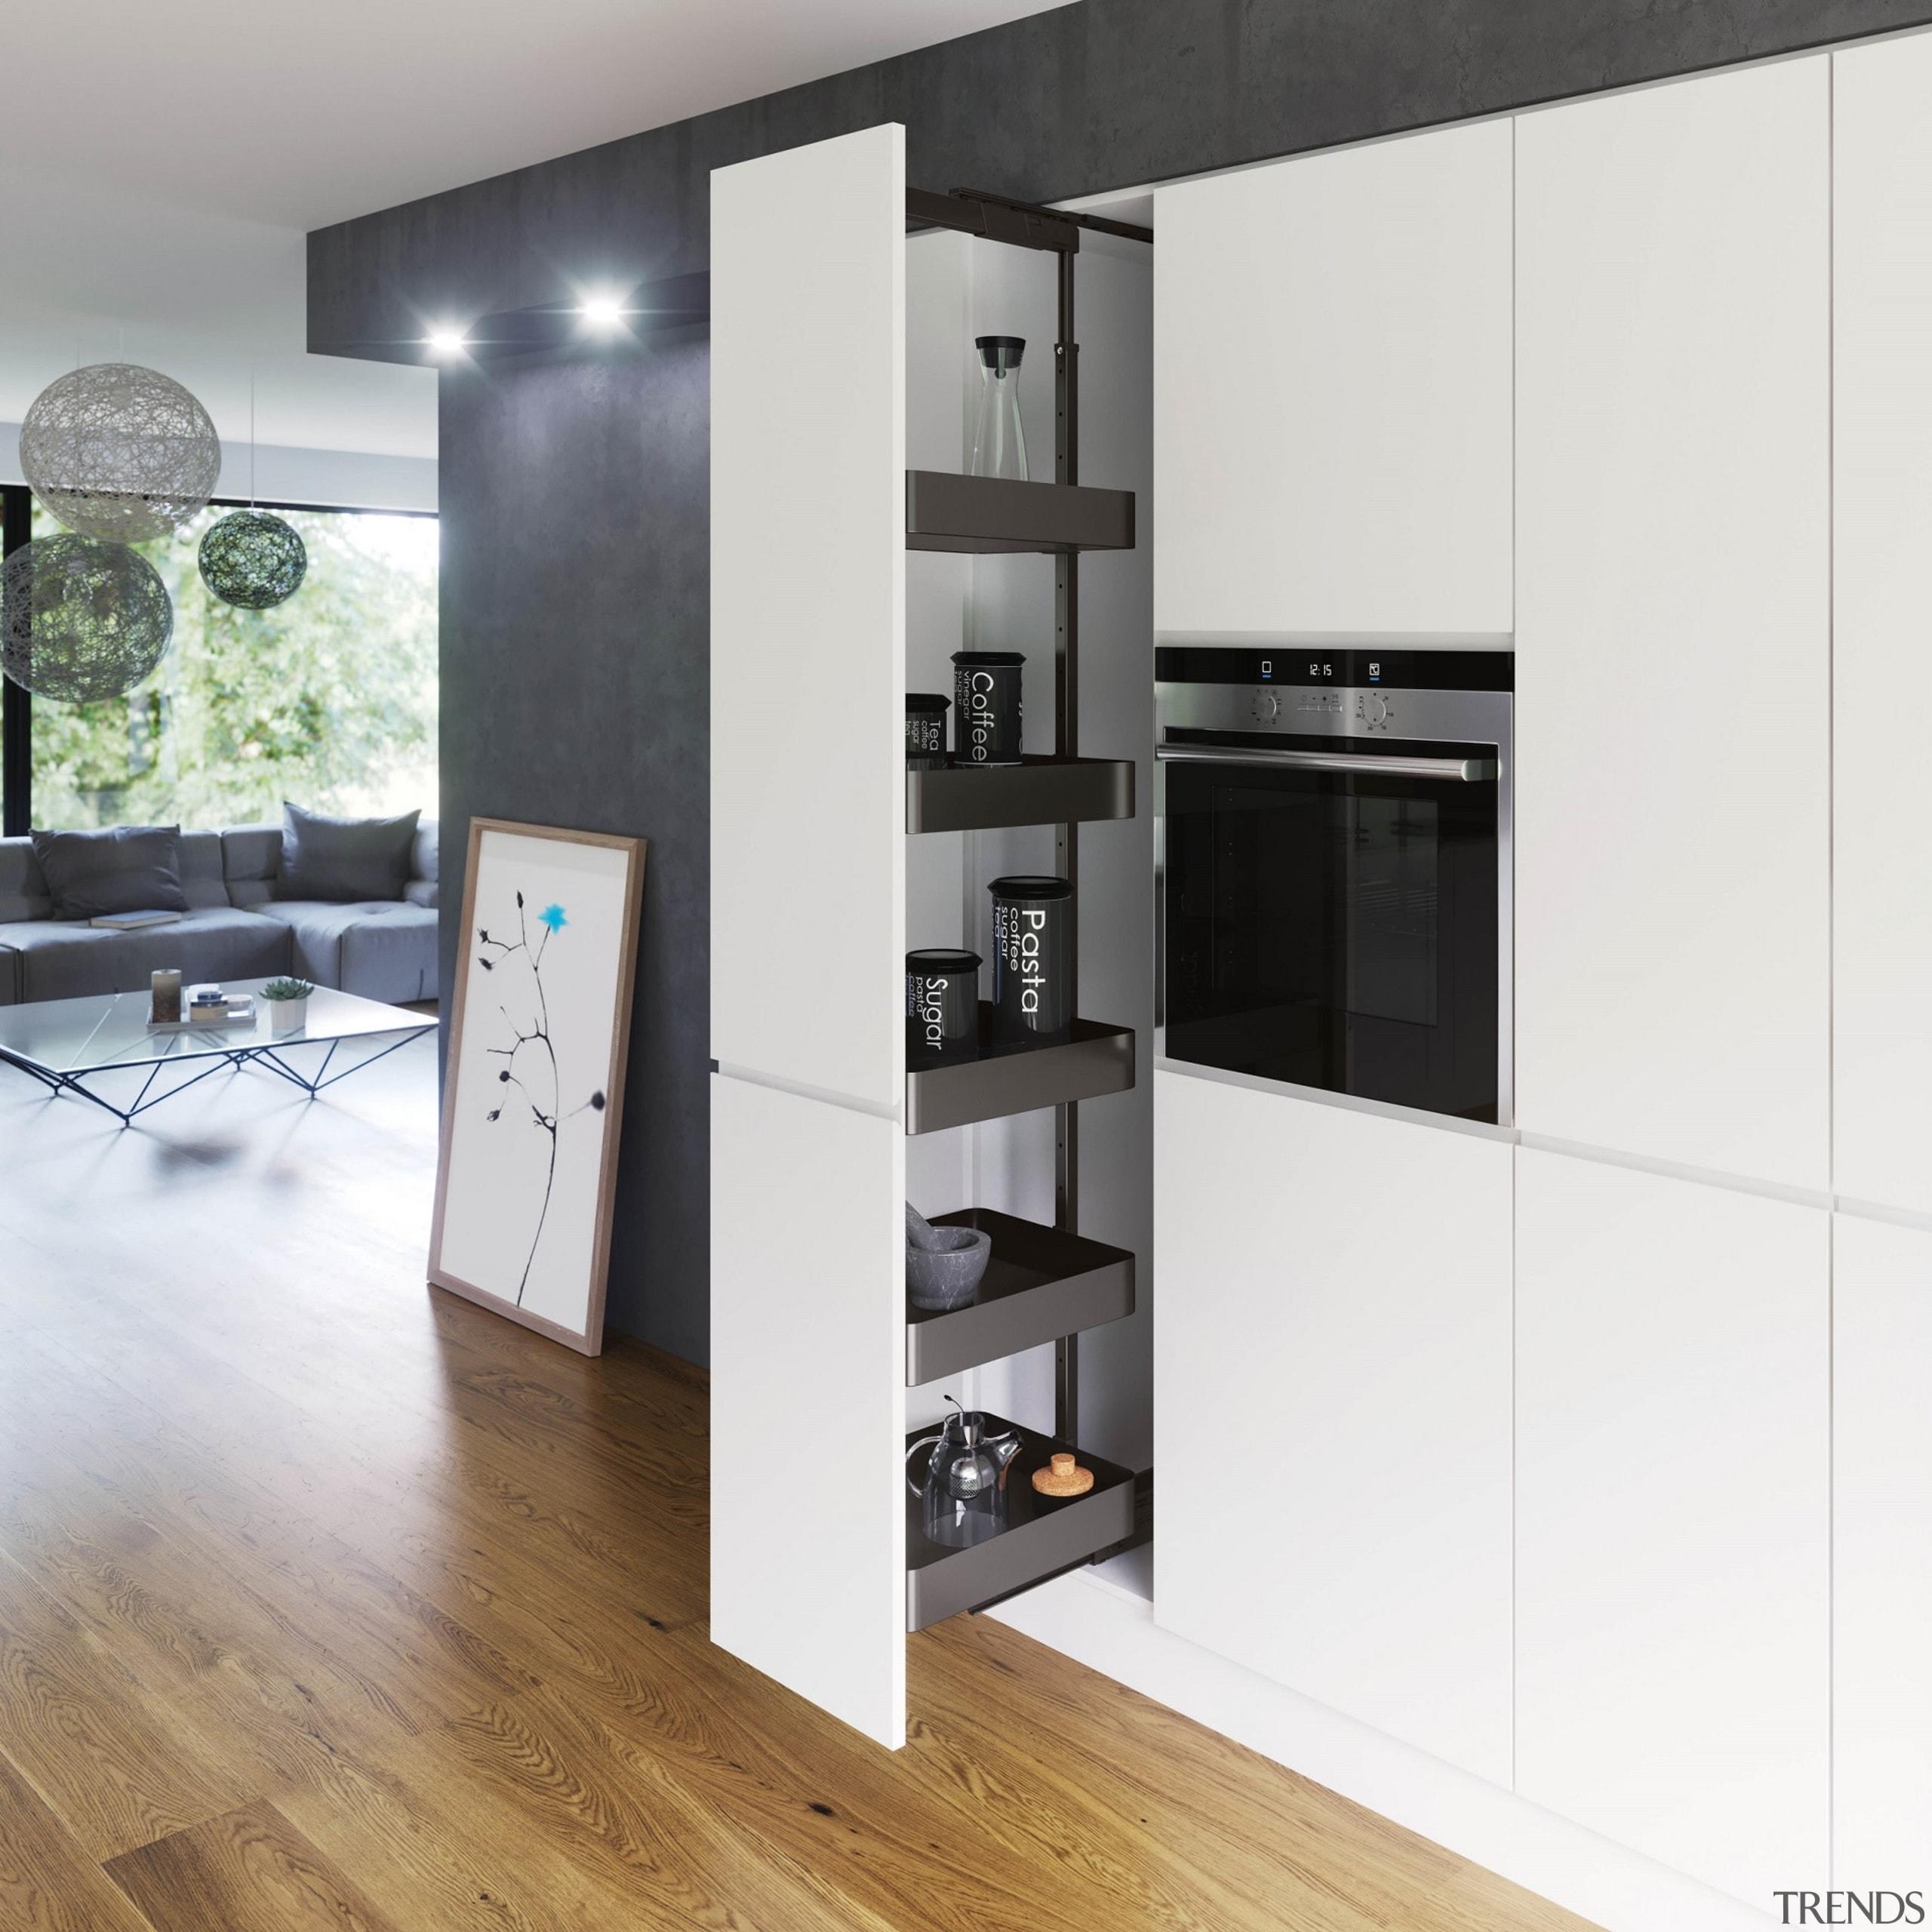 The VS TAL Larder model provides a full cabinetry, furniture, interior design, kitchen, shelving, white